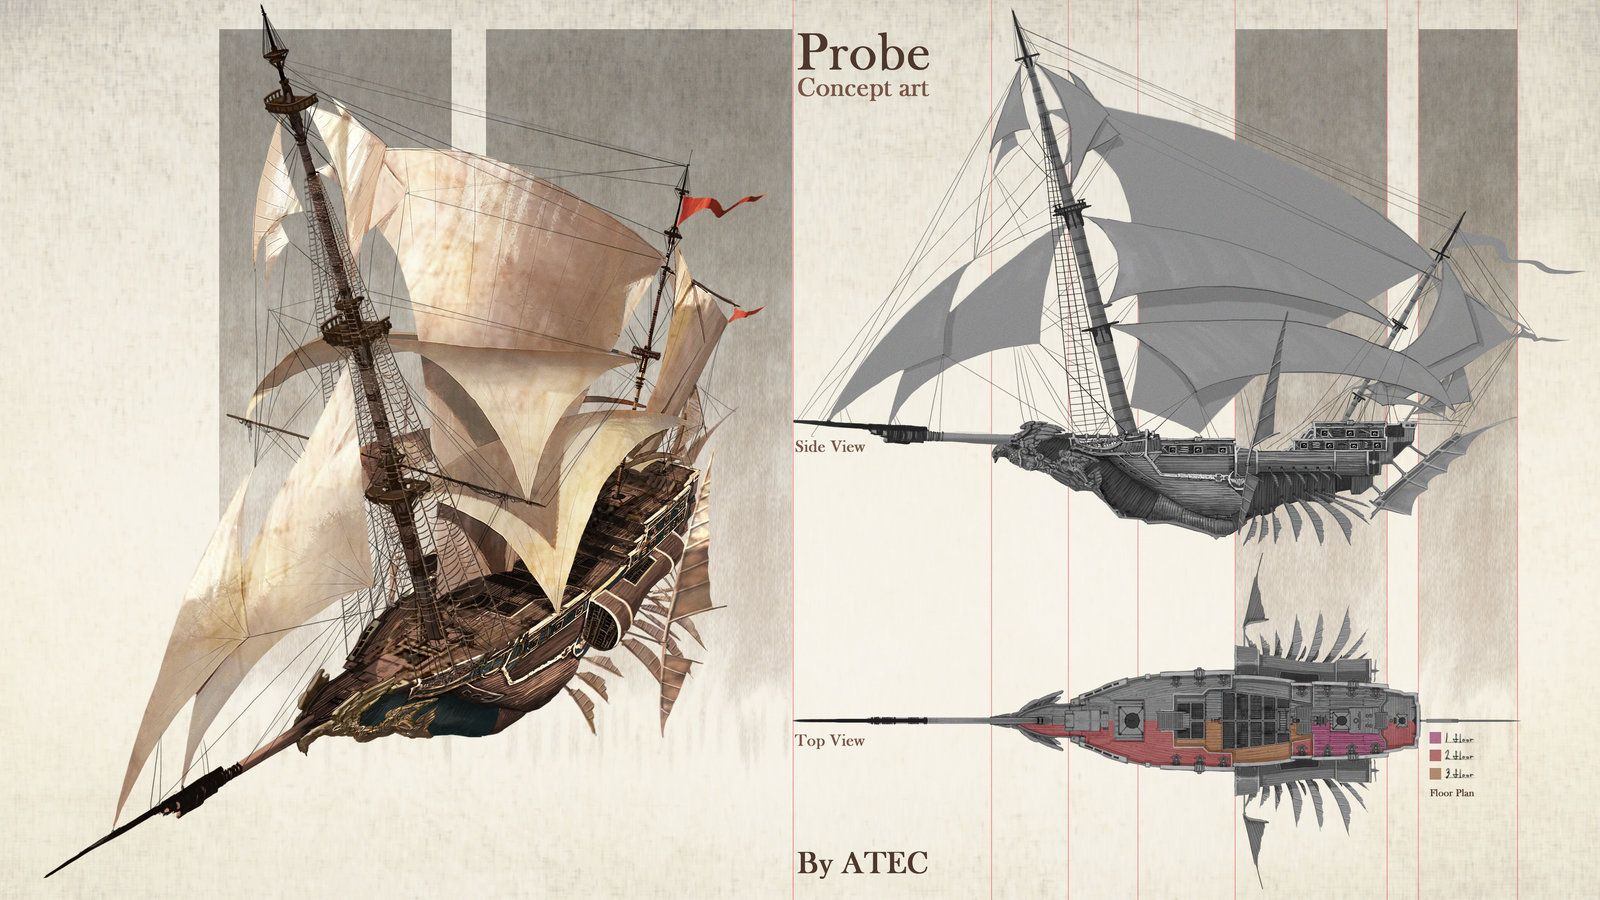 probe, ATEC concept artist on ArtStation at https://www.artstation.com/artwork/YB8bP